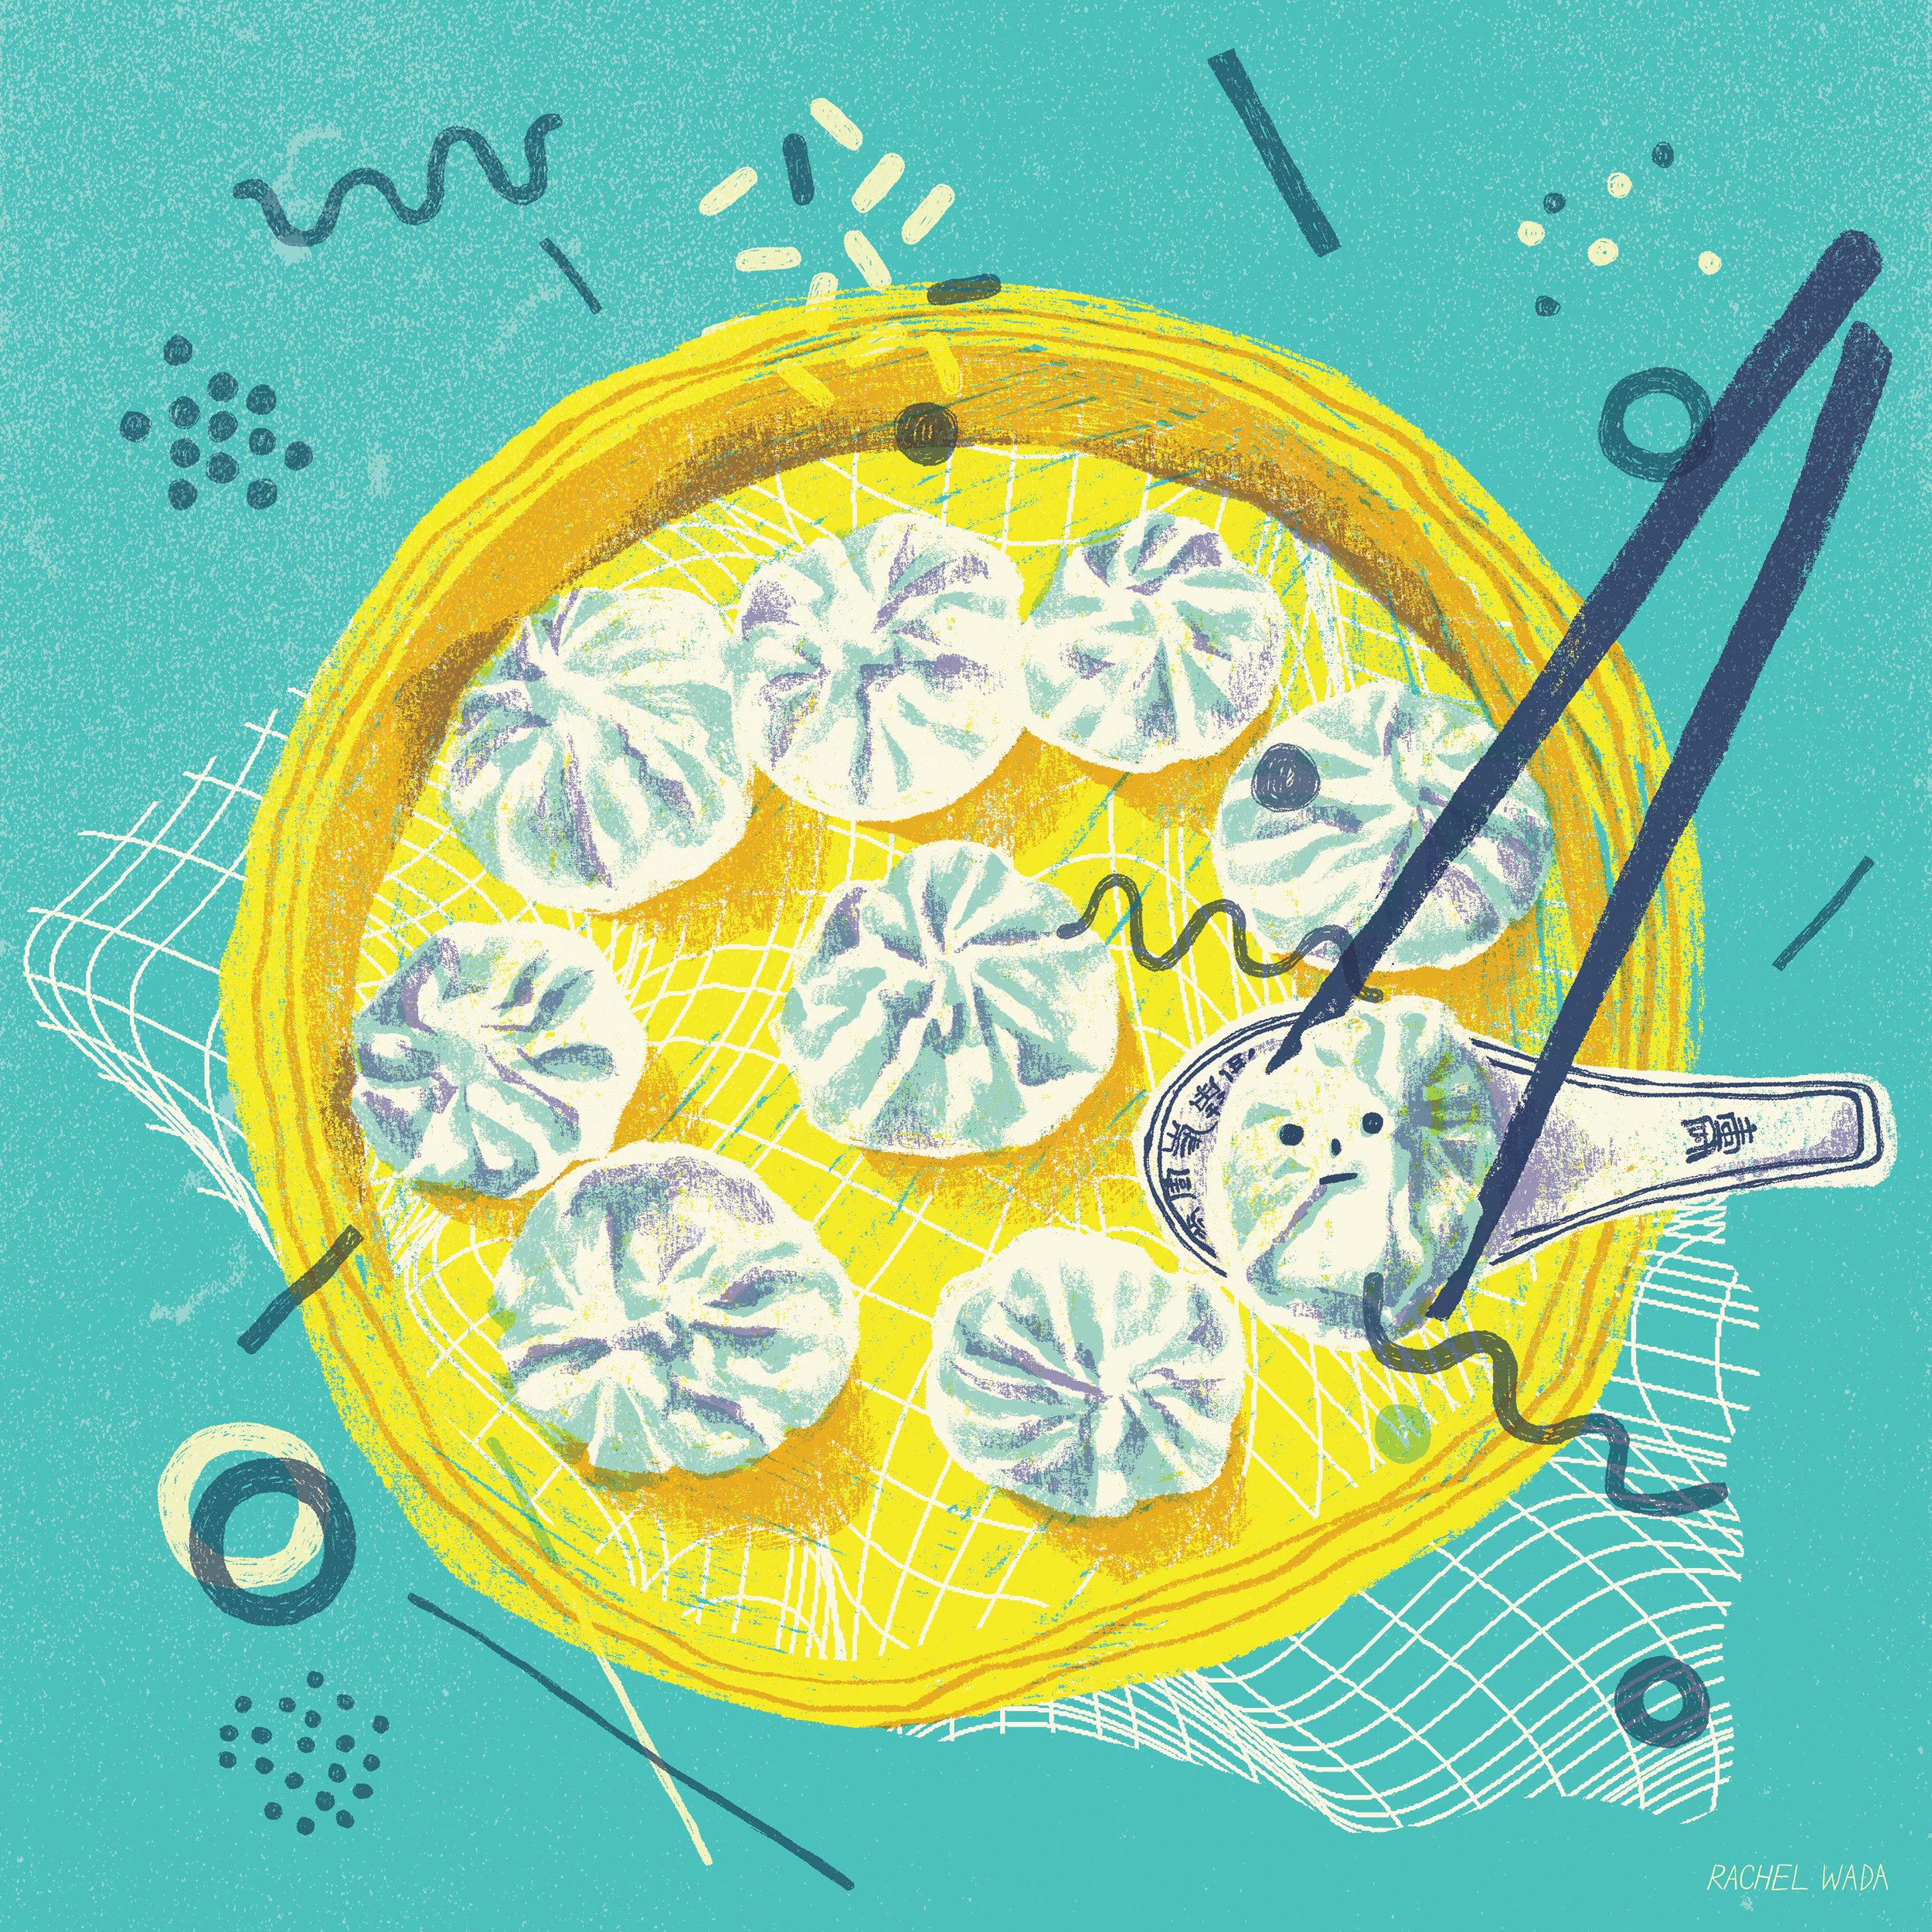 Rachel Wada - Bao - Print Ready - Resized for Web.jpg